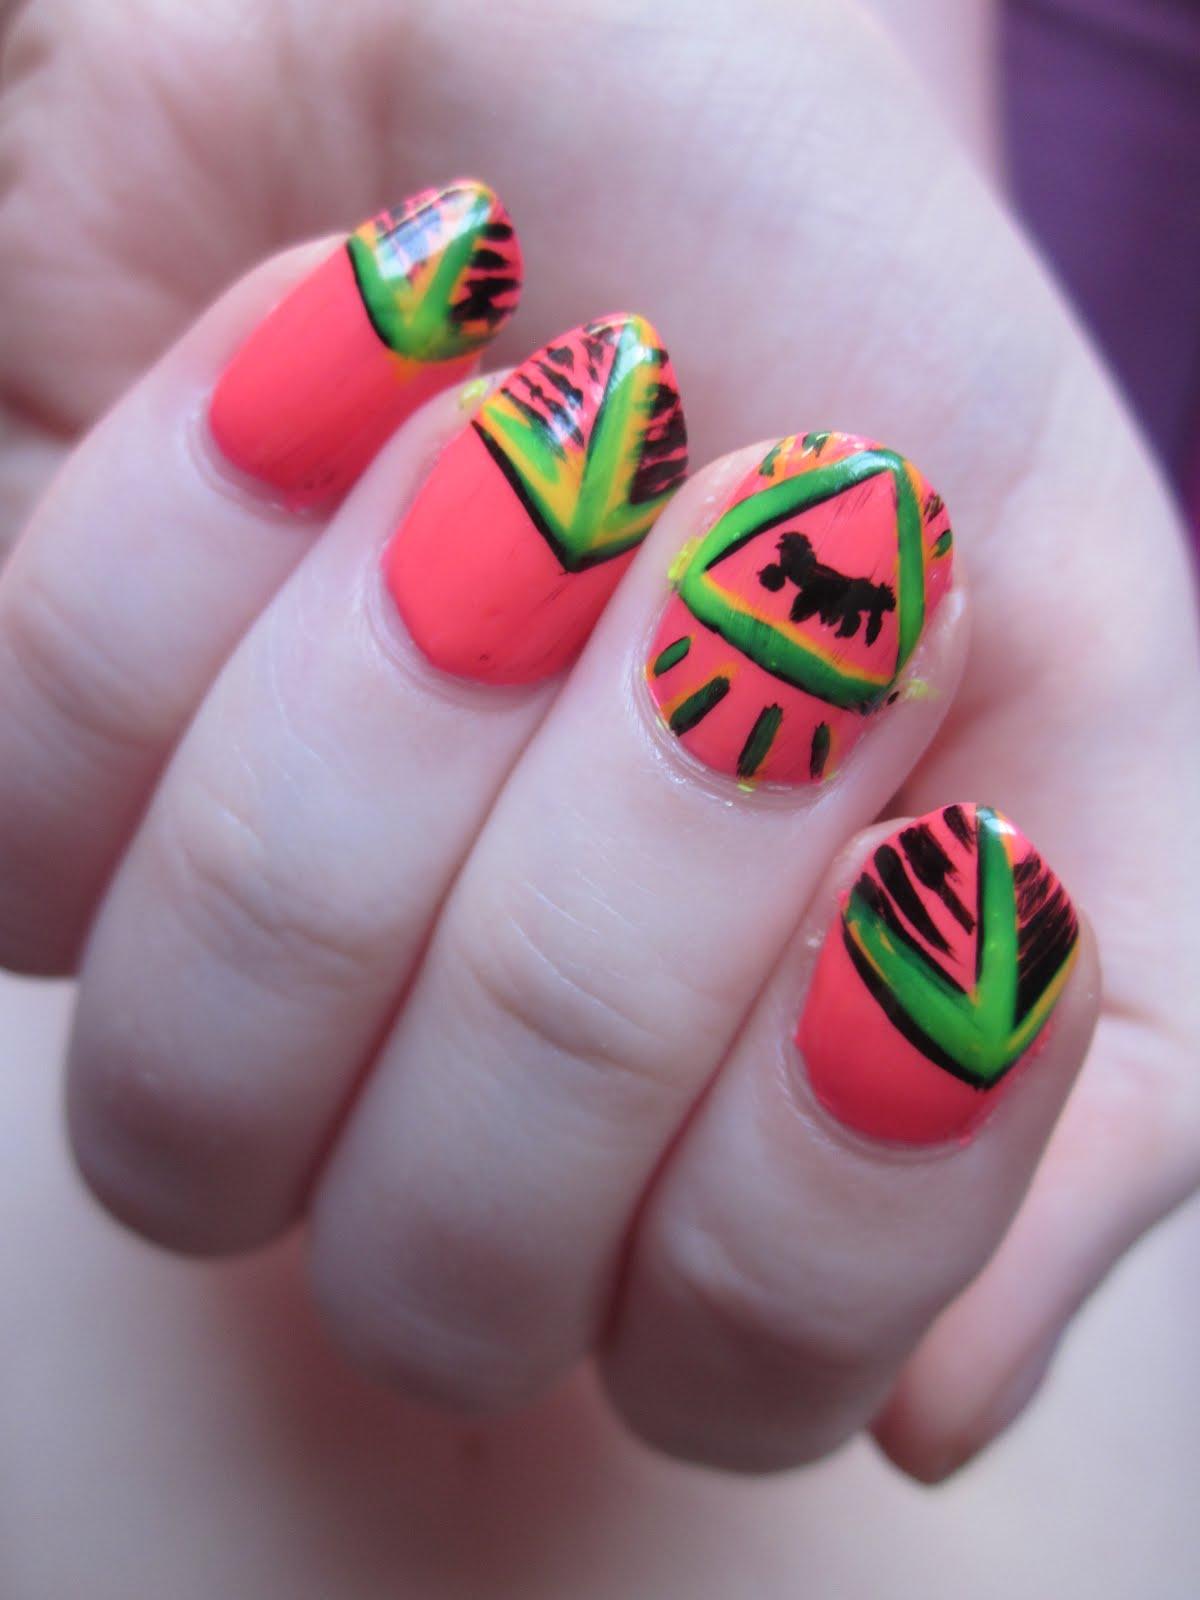 Plastizine Dream: Neon Pyramid Nail Art